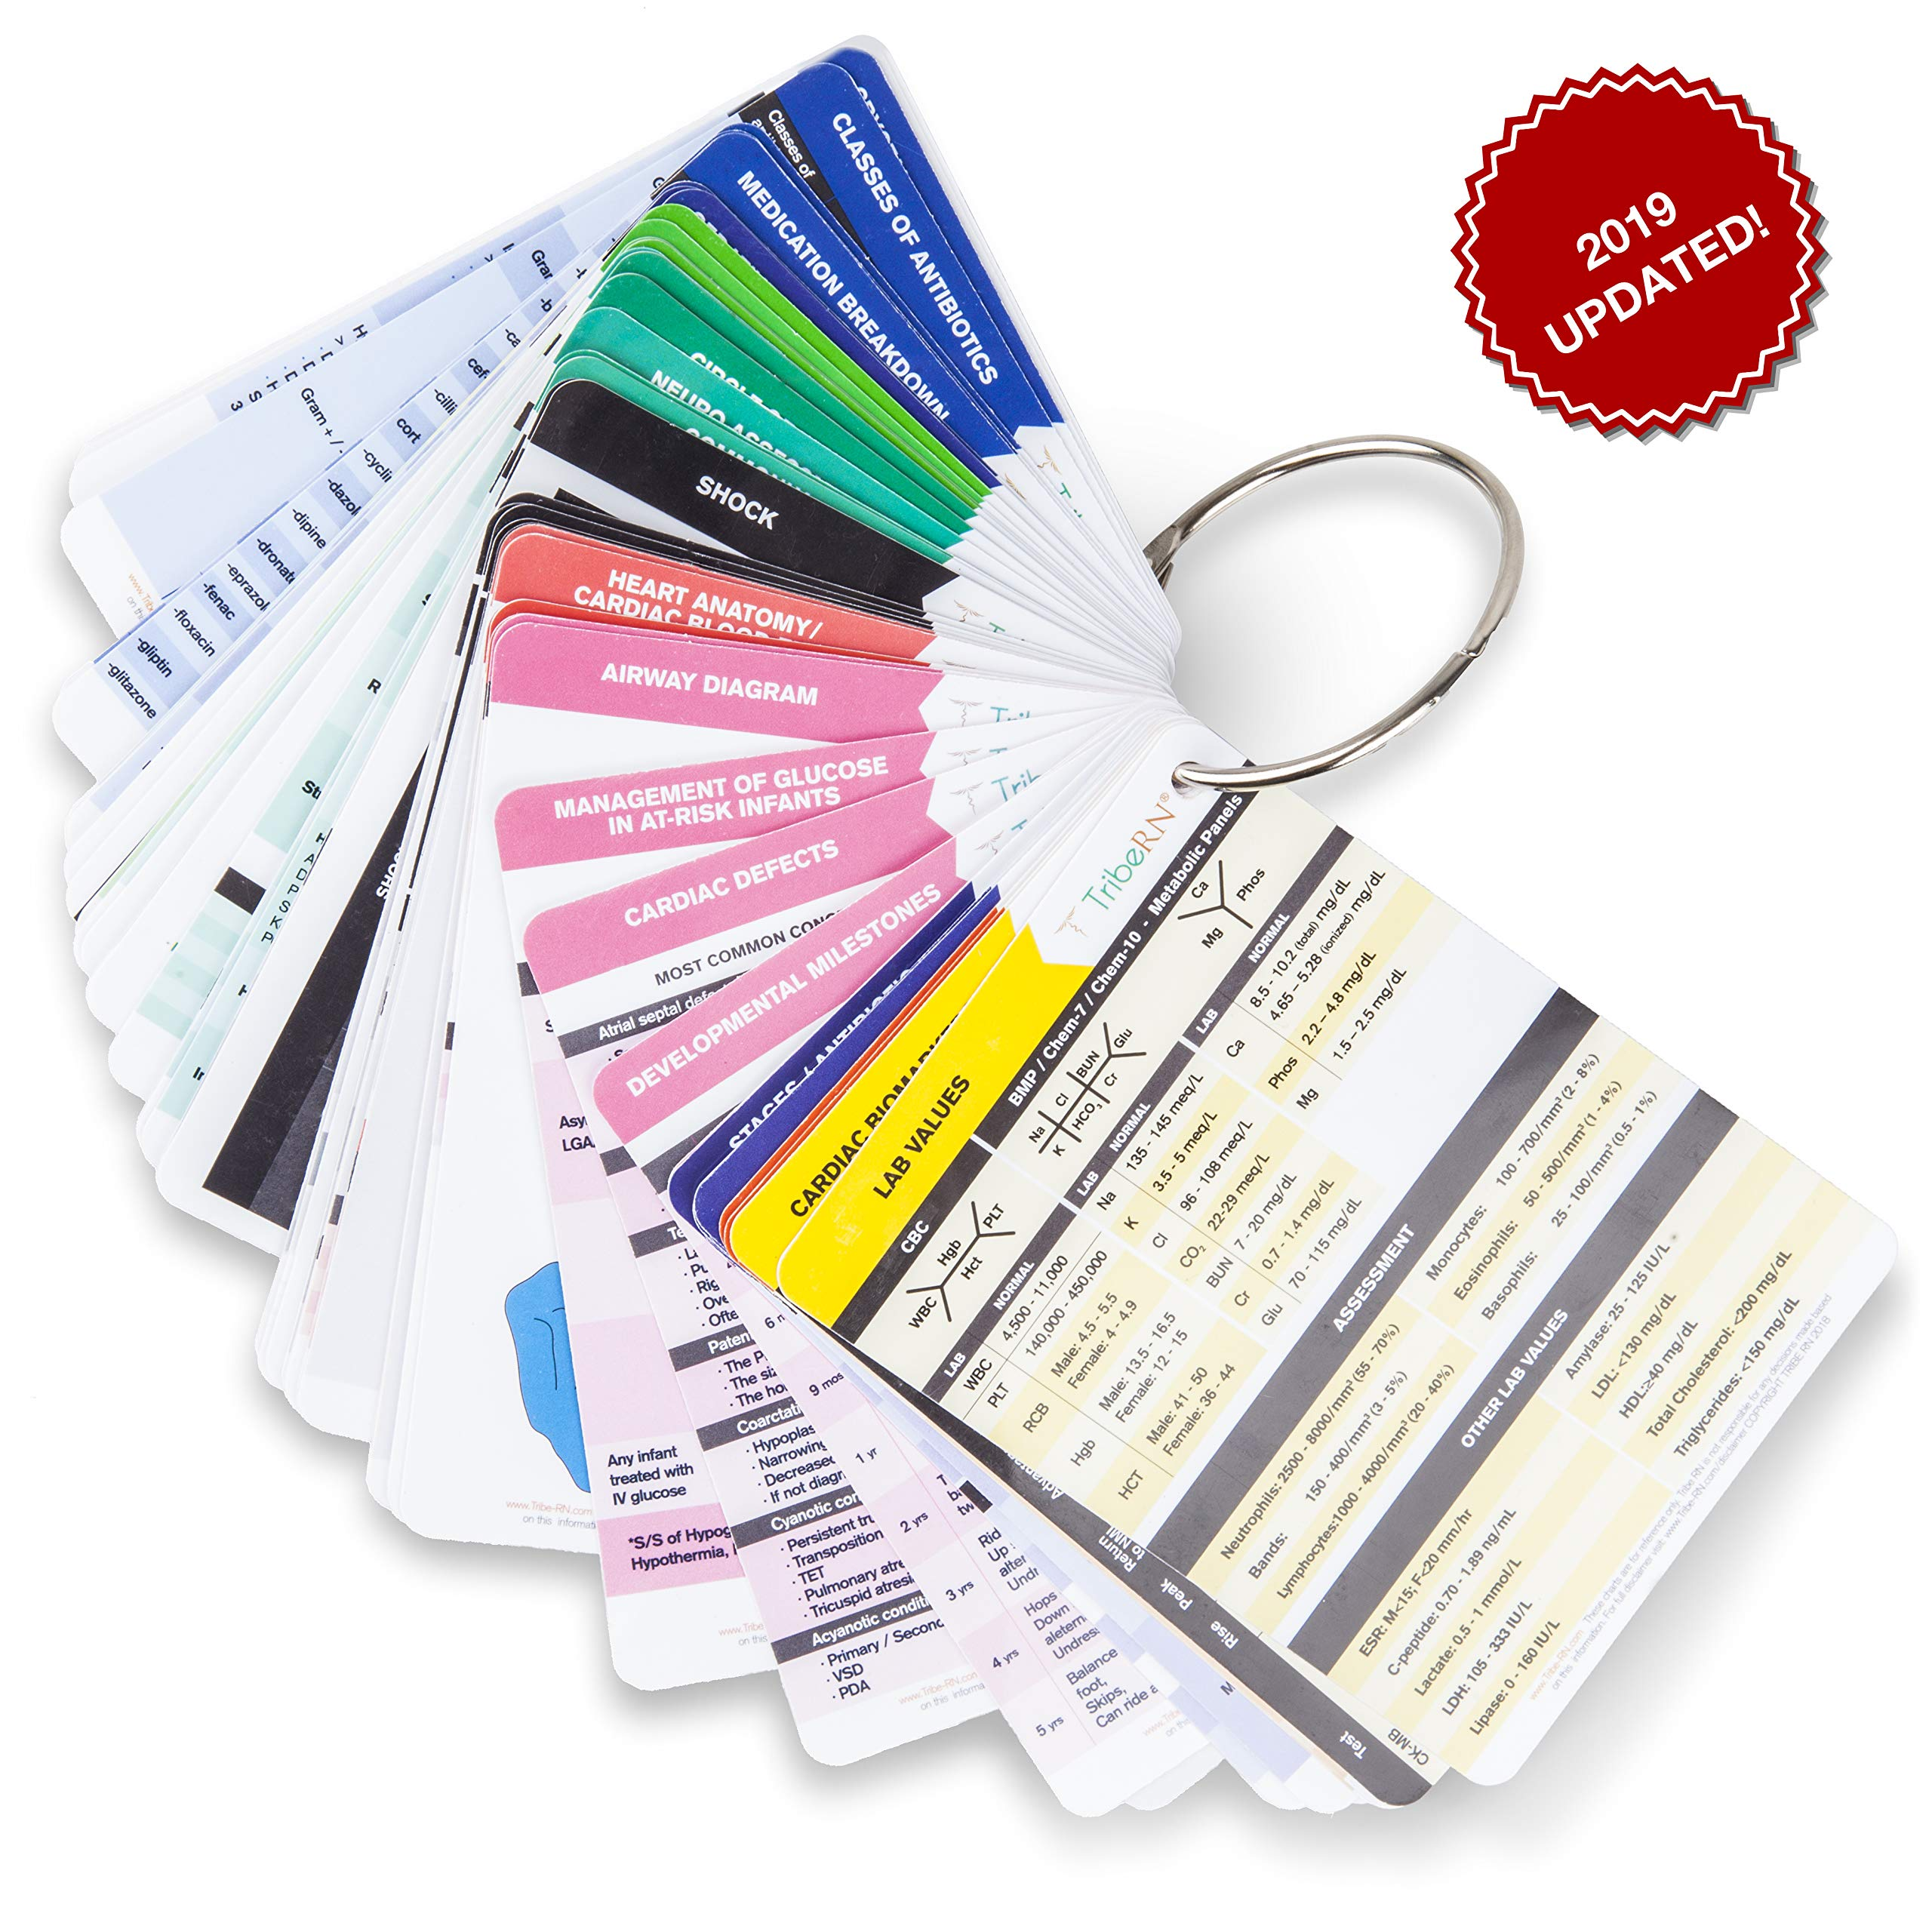 2019 PocketGuru Set by Tribe RN - 85 Scrub Pocket Sized Nurse Reference Cards - (Bonus Nursing Cheat Sheets) Perfect Nurse or Nursing Student Gifts - Studying and Clinical Rounds